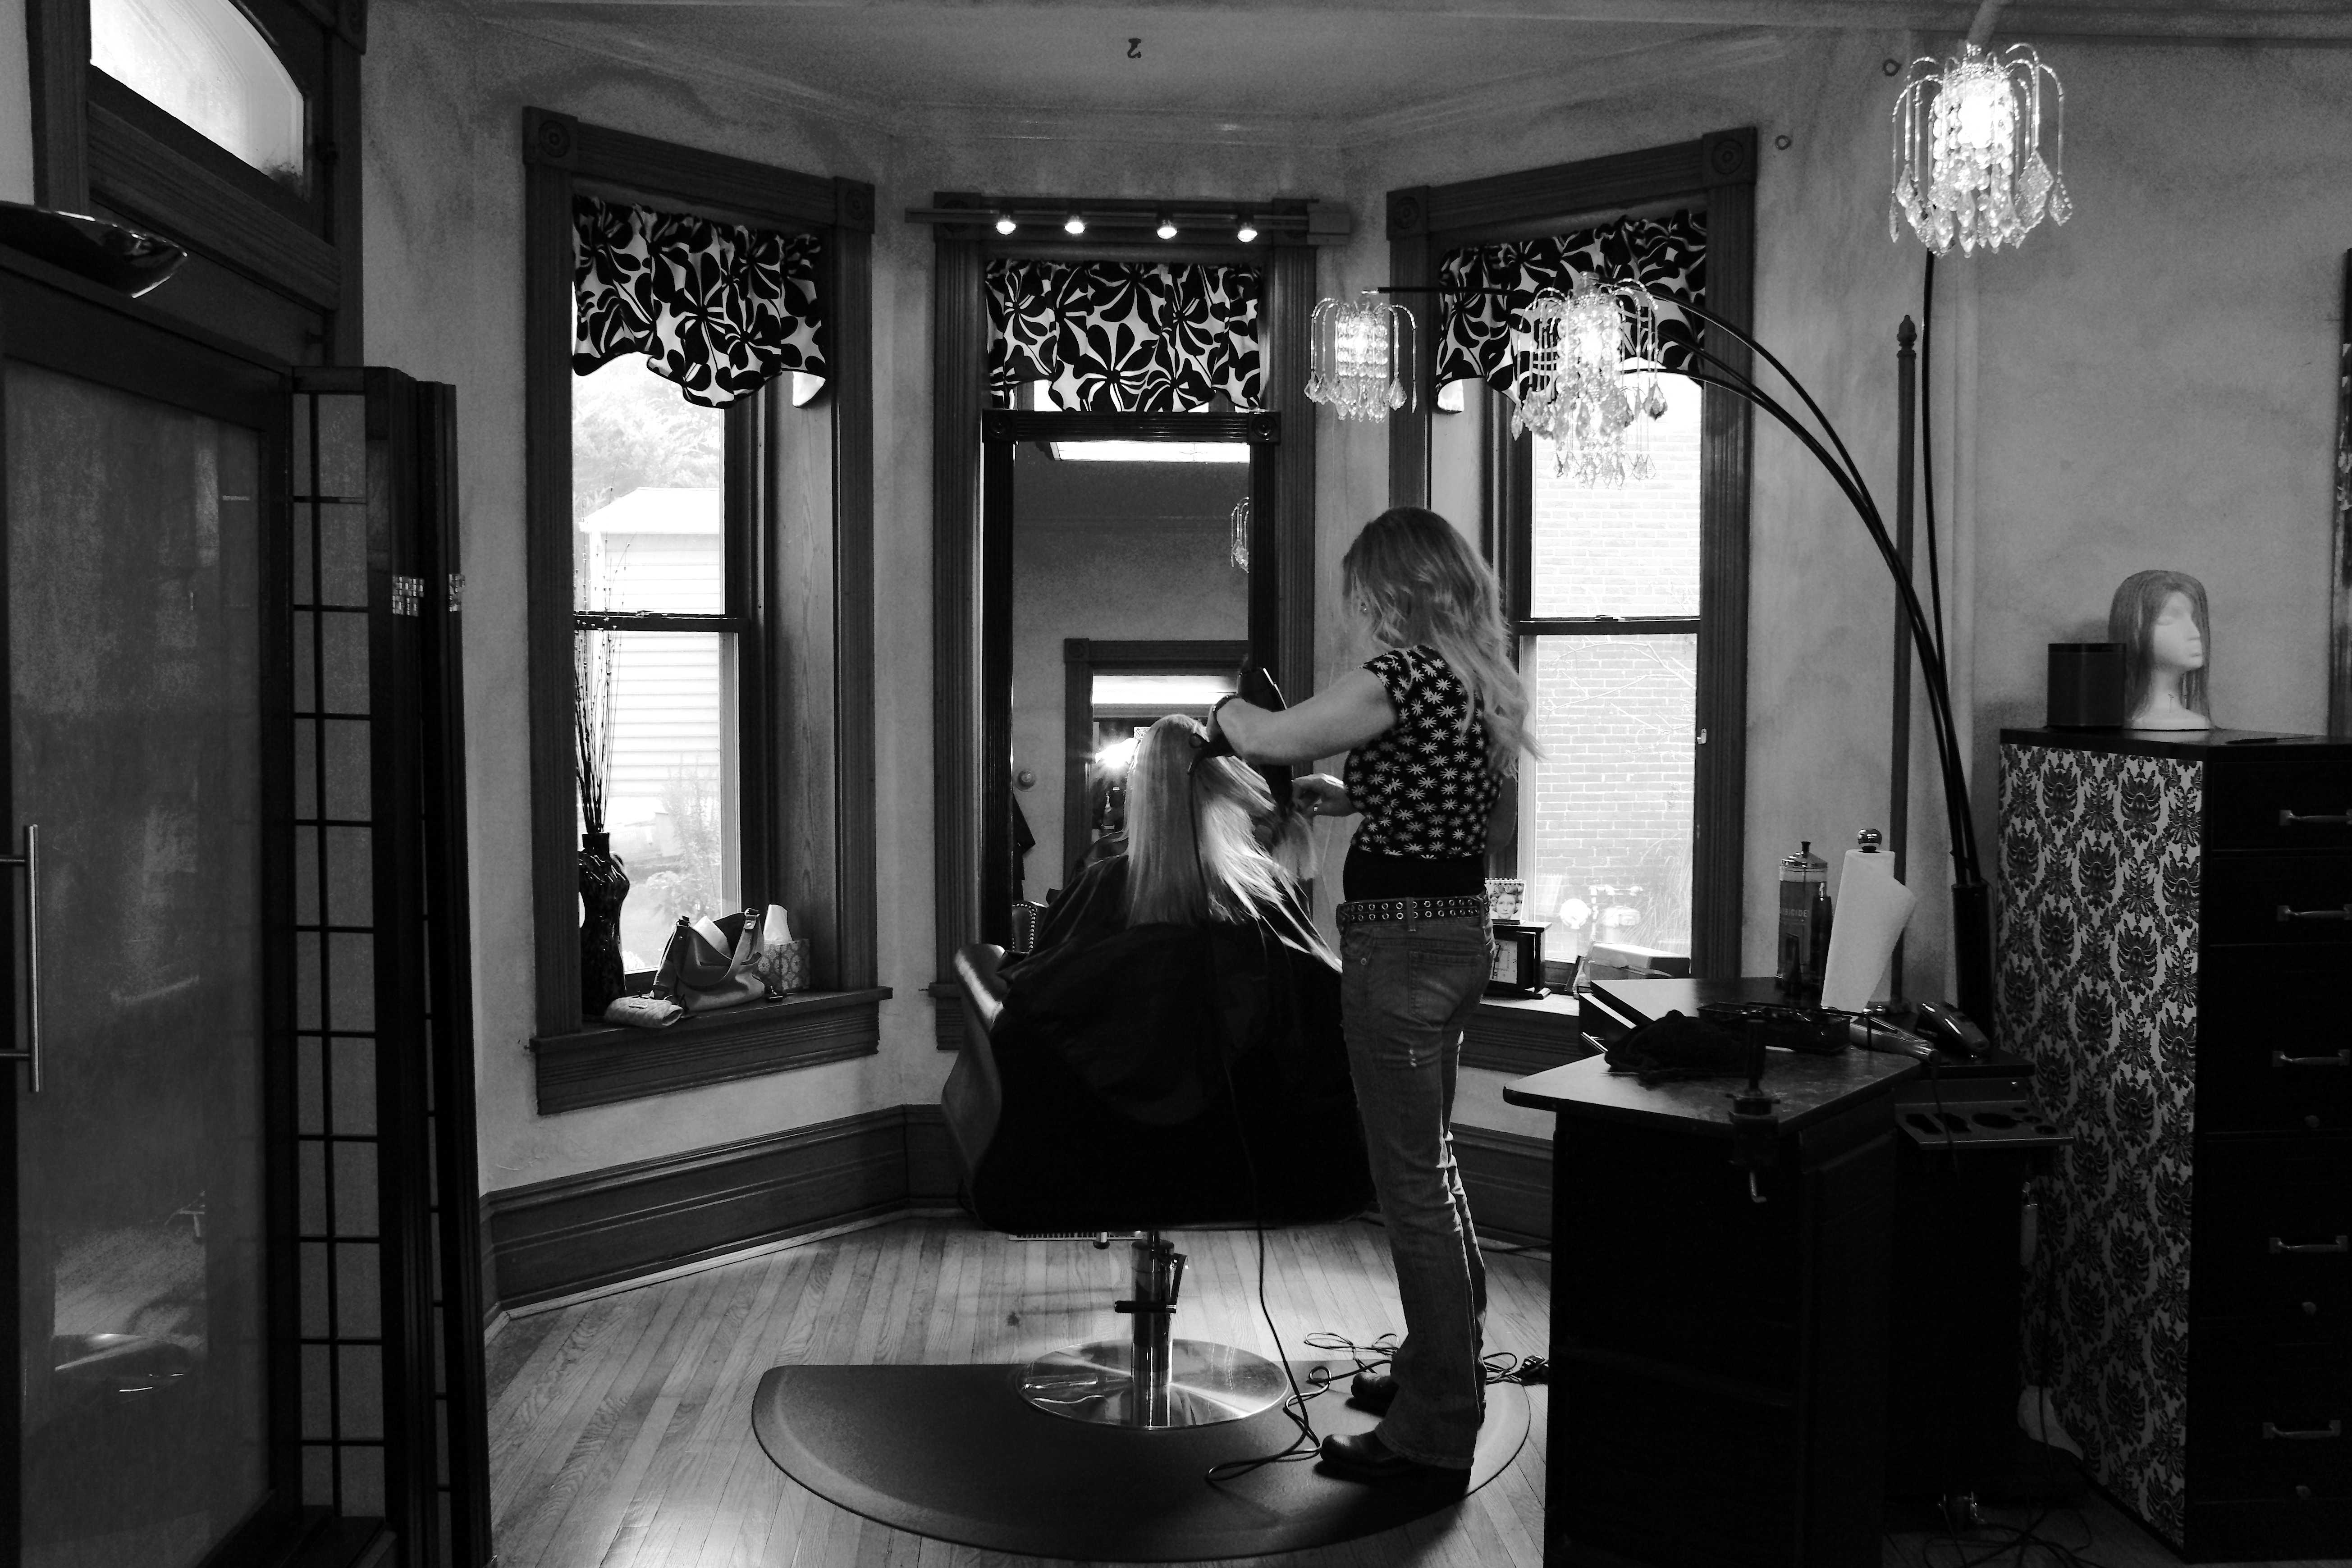 Lancaster pa beauty salon hair services gallery mia for 717 salon lancaster pa